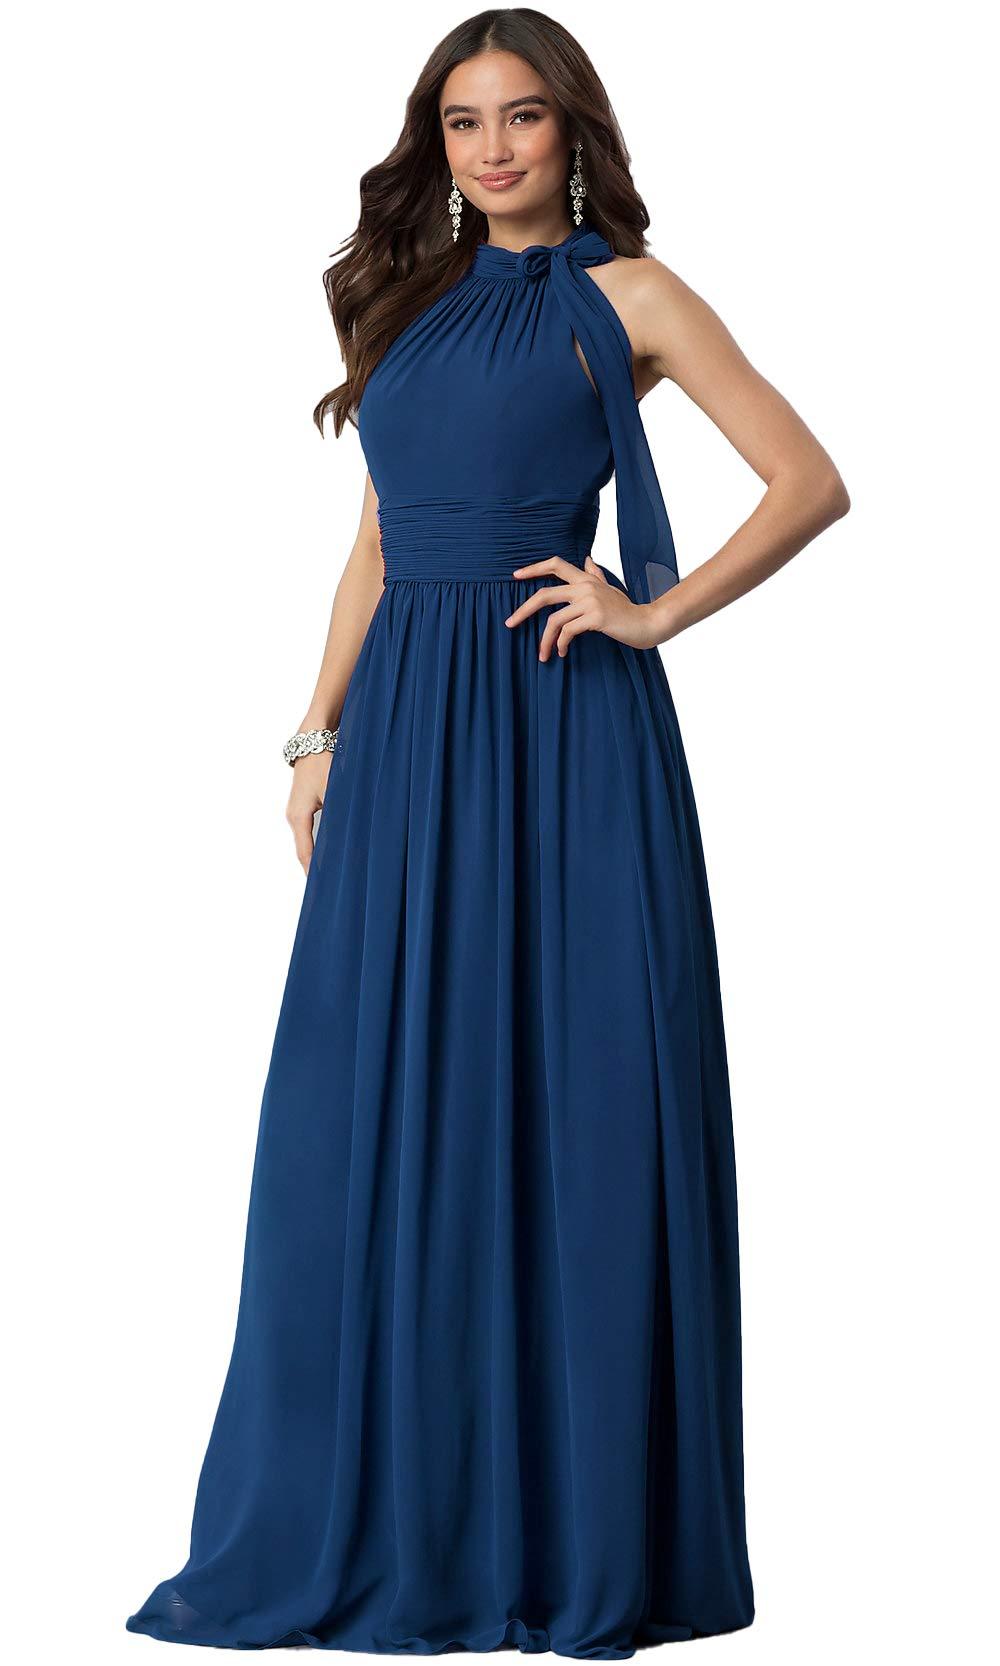 Aofur New Lace Long Chiffon Formal Evening Bridesmaid Dresses Maxi ...